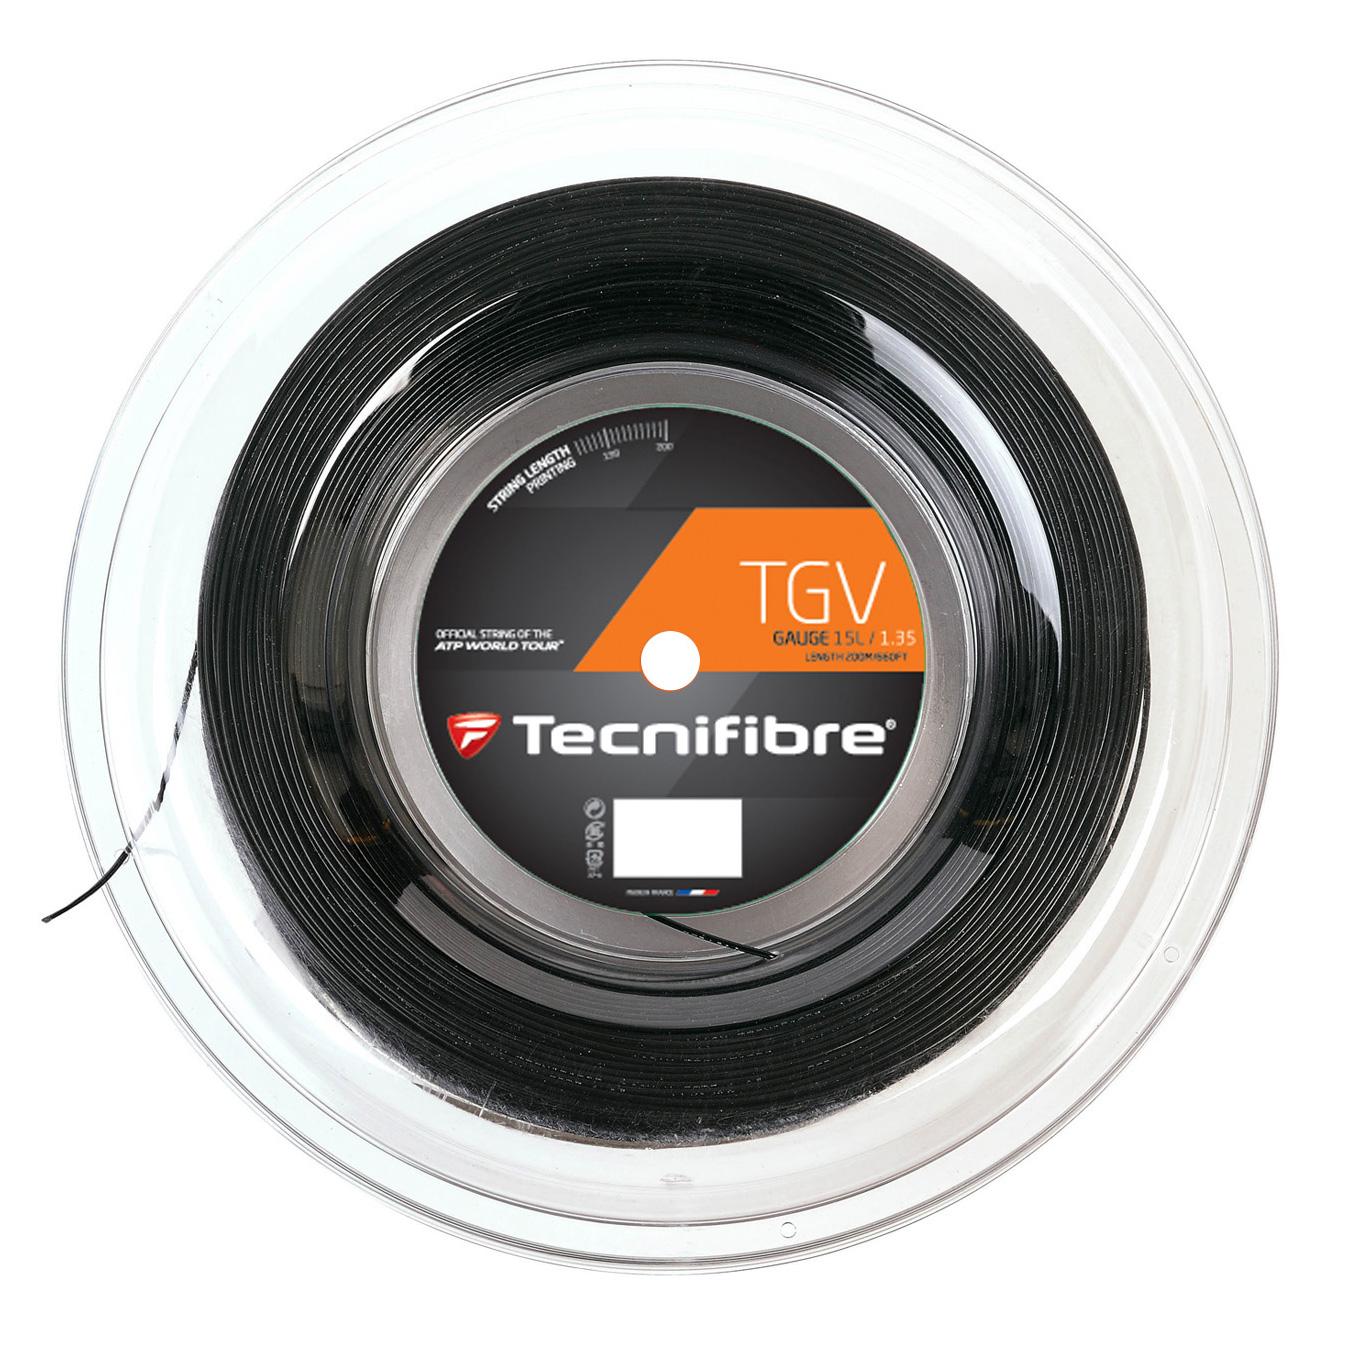 Tecnifibre TGV 1.35 Tennis String 200m Reel - Black